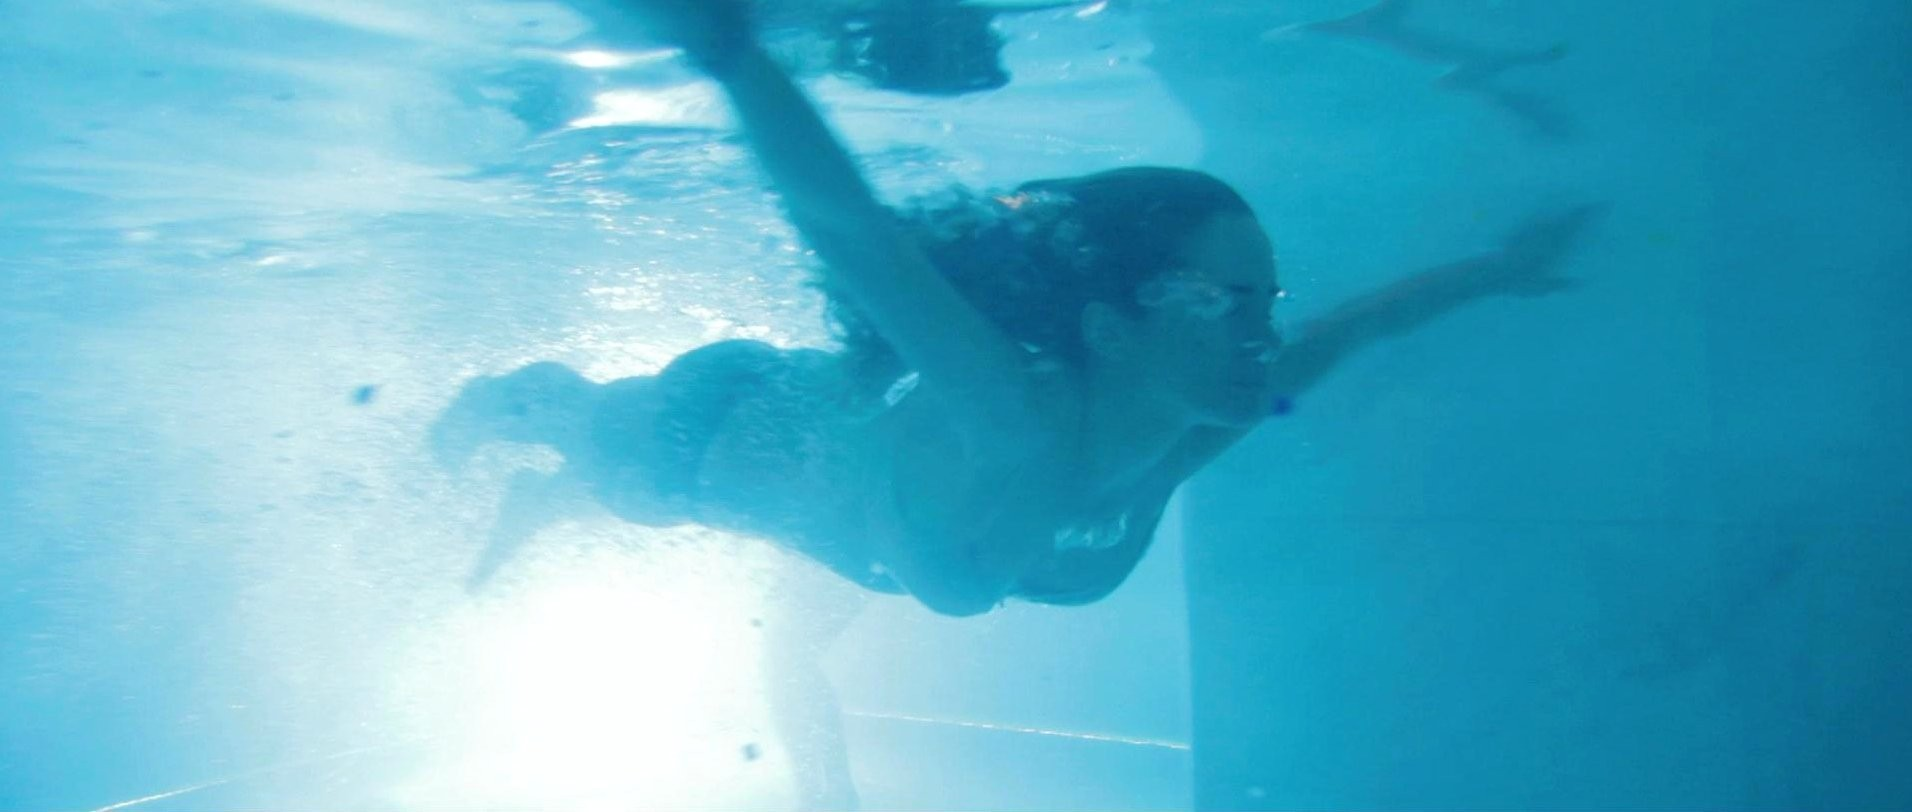 Alicia Sanz pillada desnuda